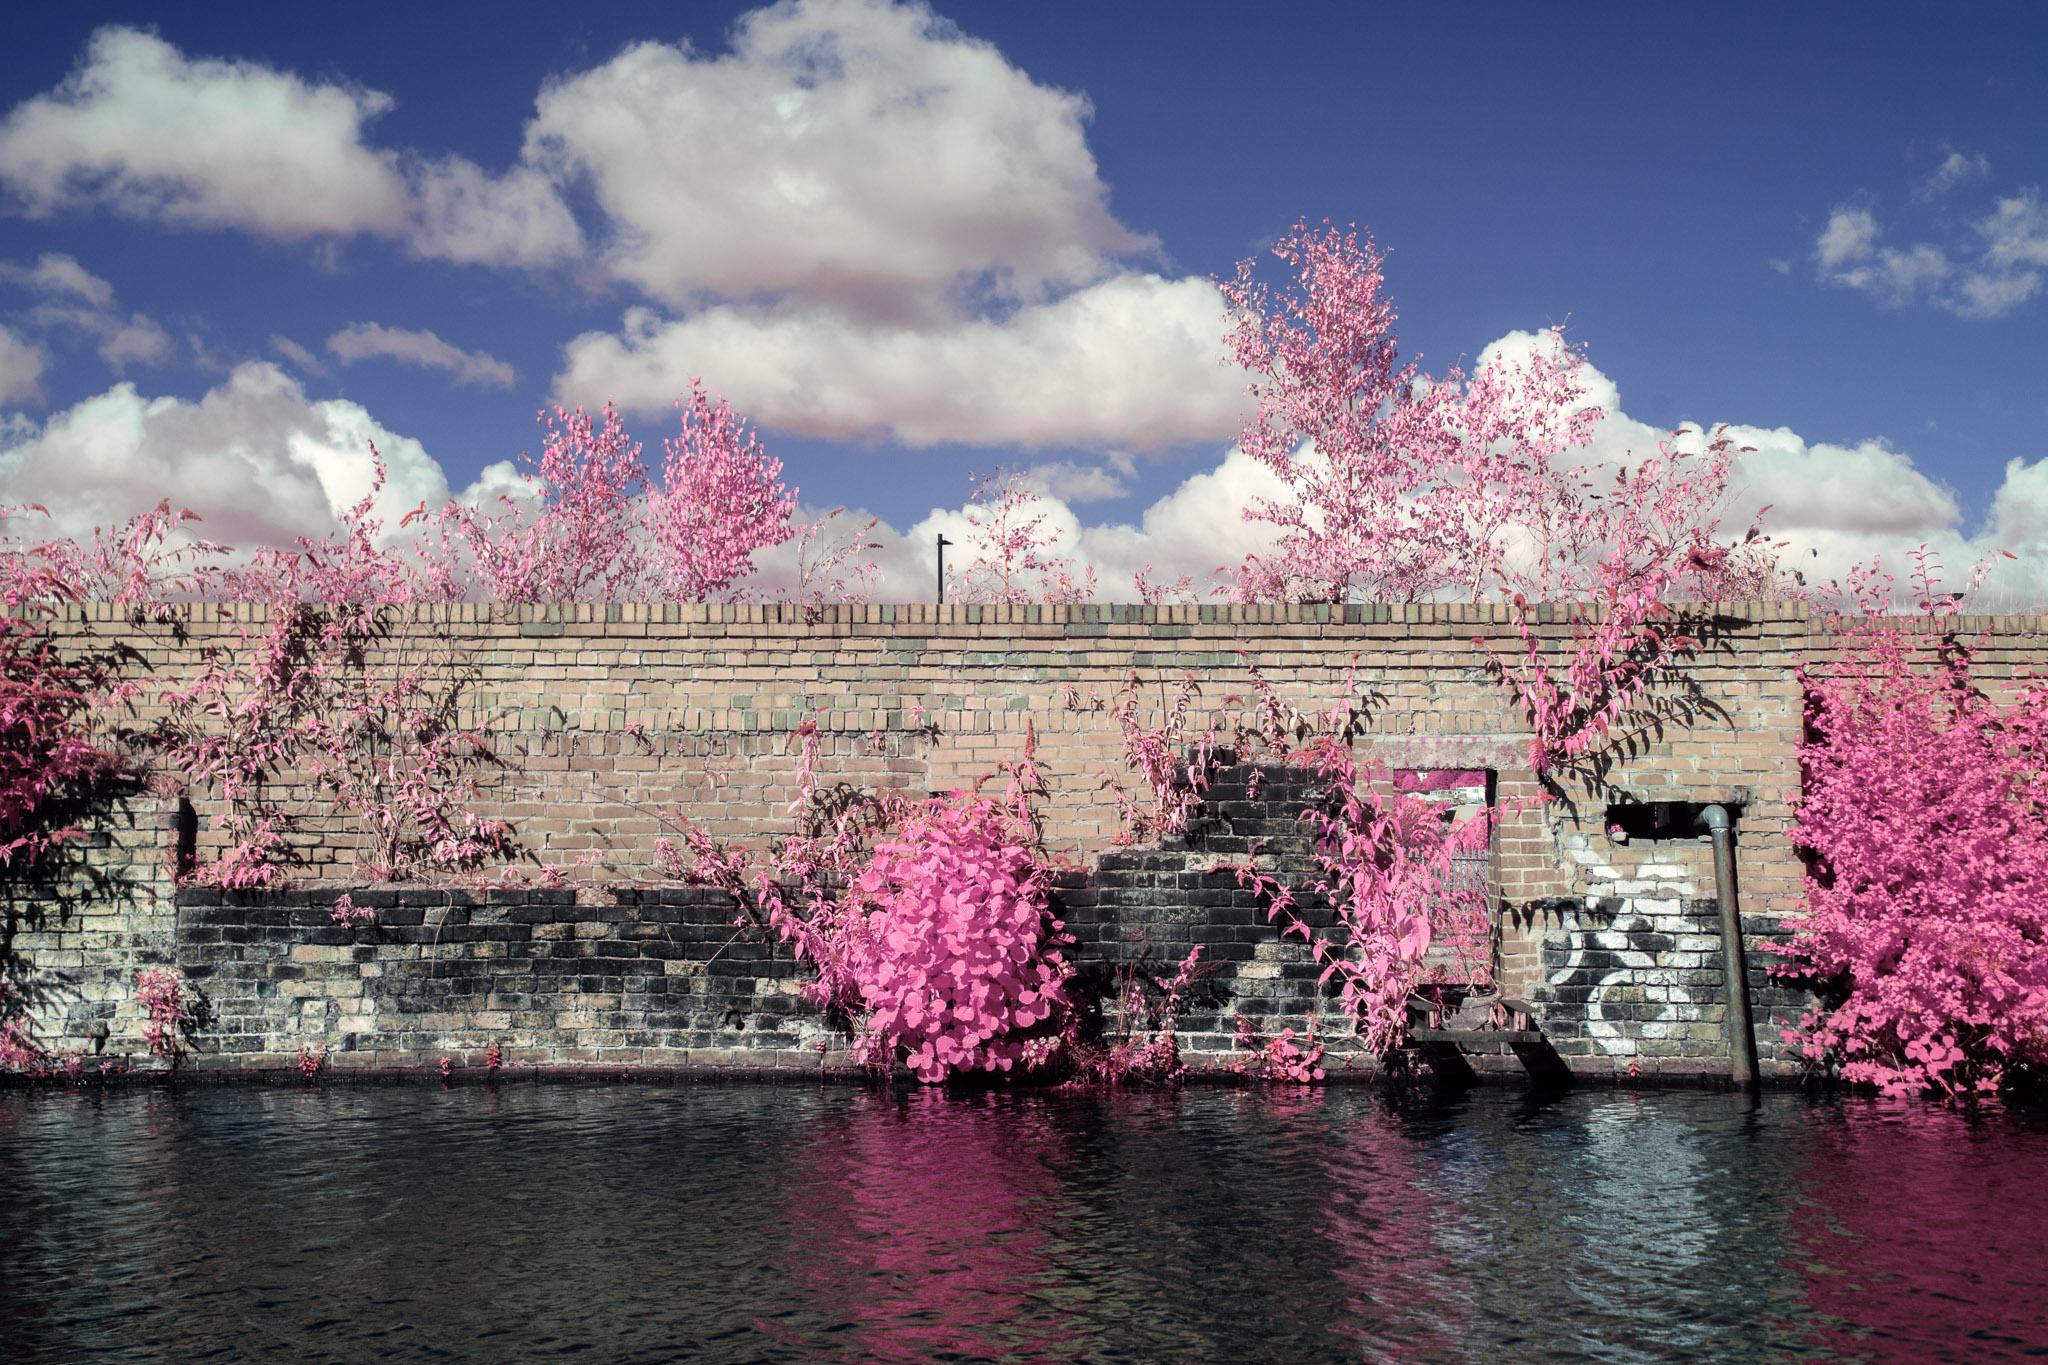 Kodak EIR Colour Infrared, Edgelands, Wasteland, Out of sight,  Canal ©Jonny Sutton